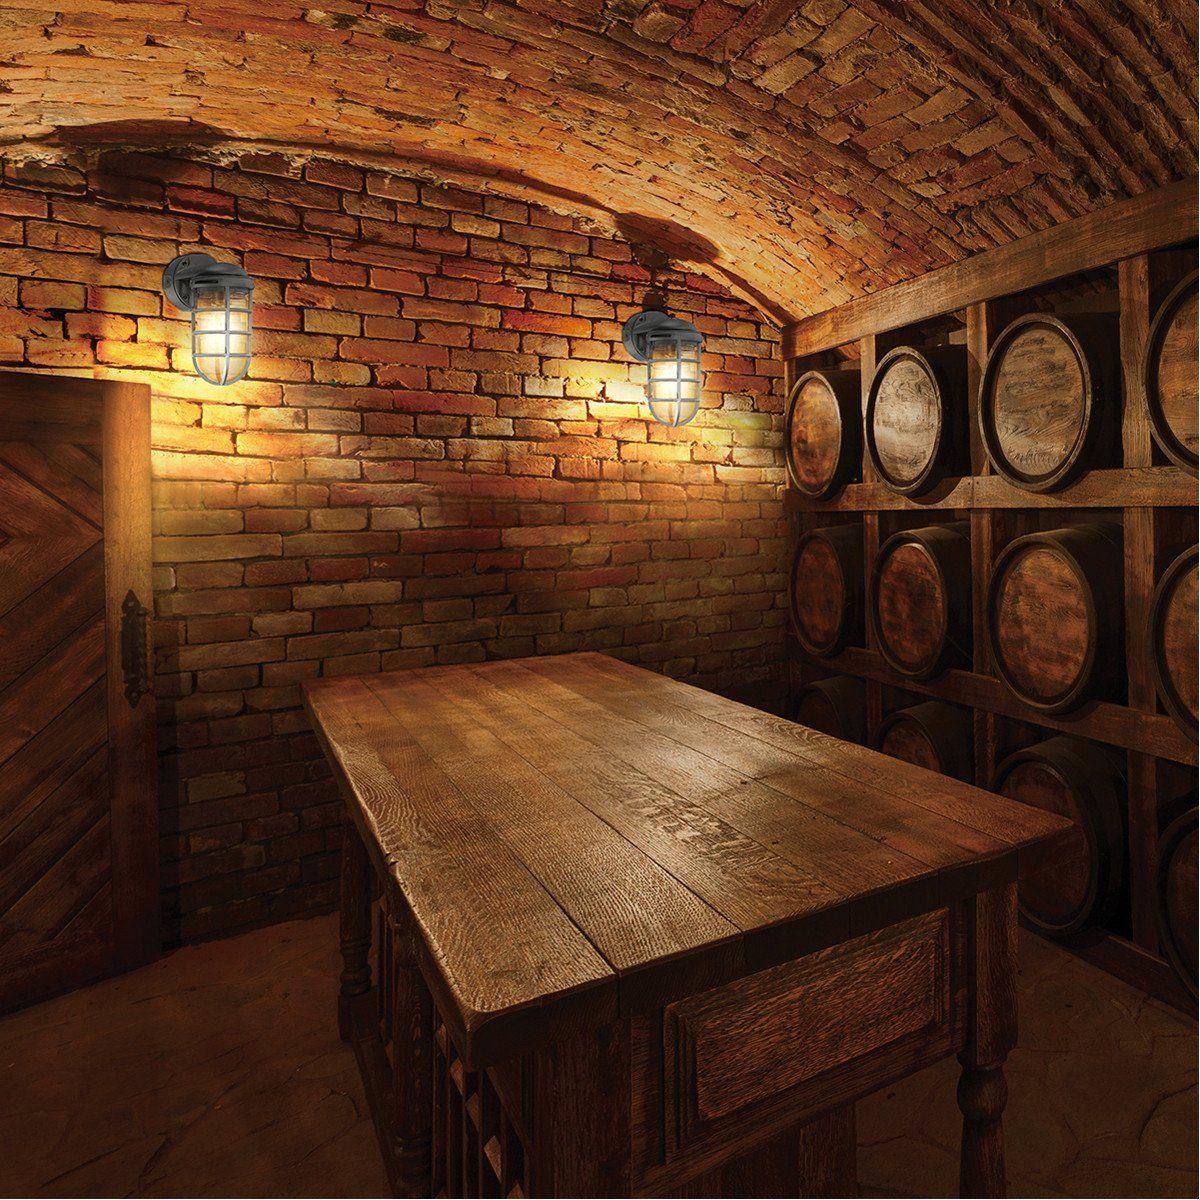 Pin By Deusinspir On Home In 2020 Home Wine Cellars Wine Cellar